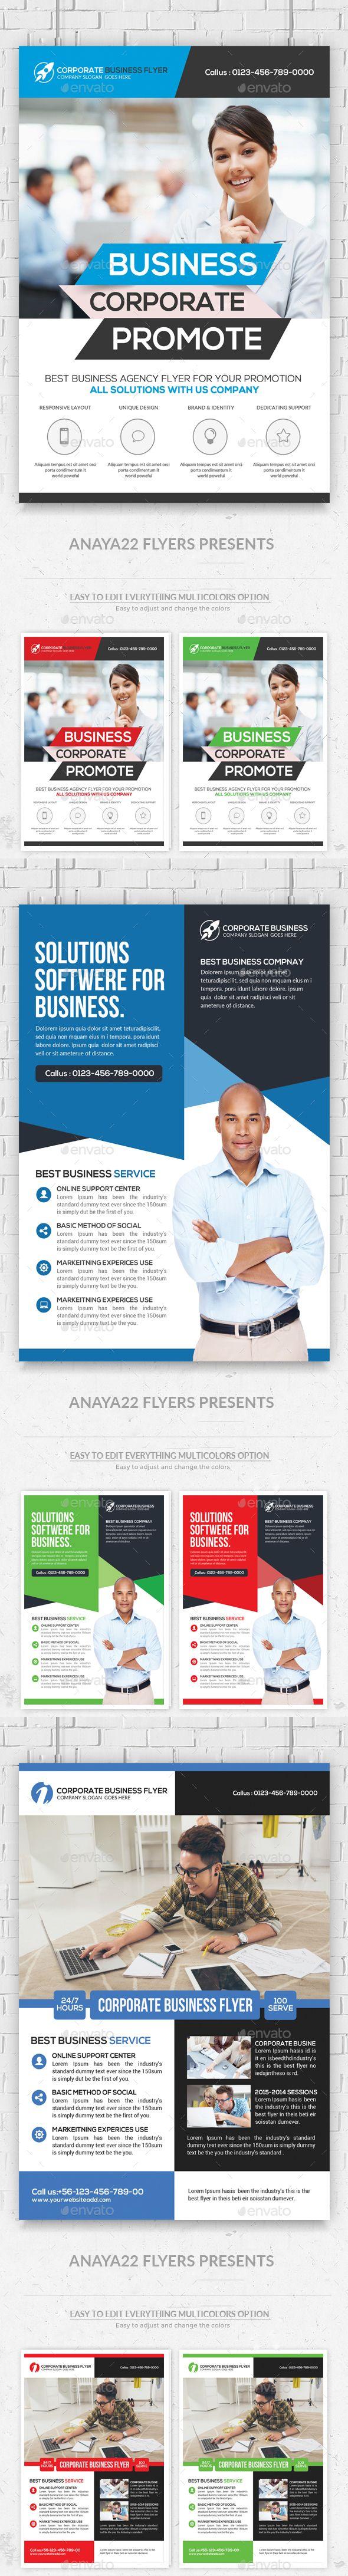 Business Flyers Bundle Template PSD #design Download: http://graphicriver.net/item/business-flyers-bundle/13633085?ref=ksioks